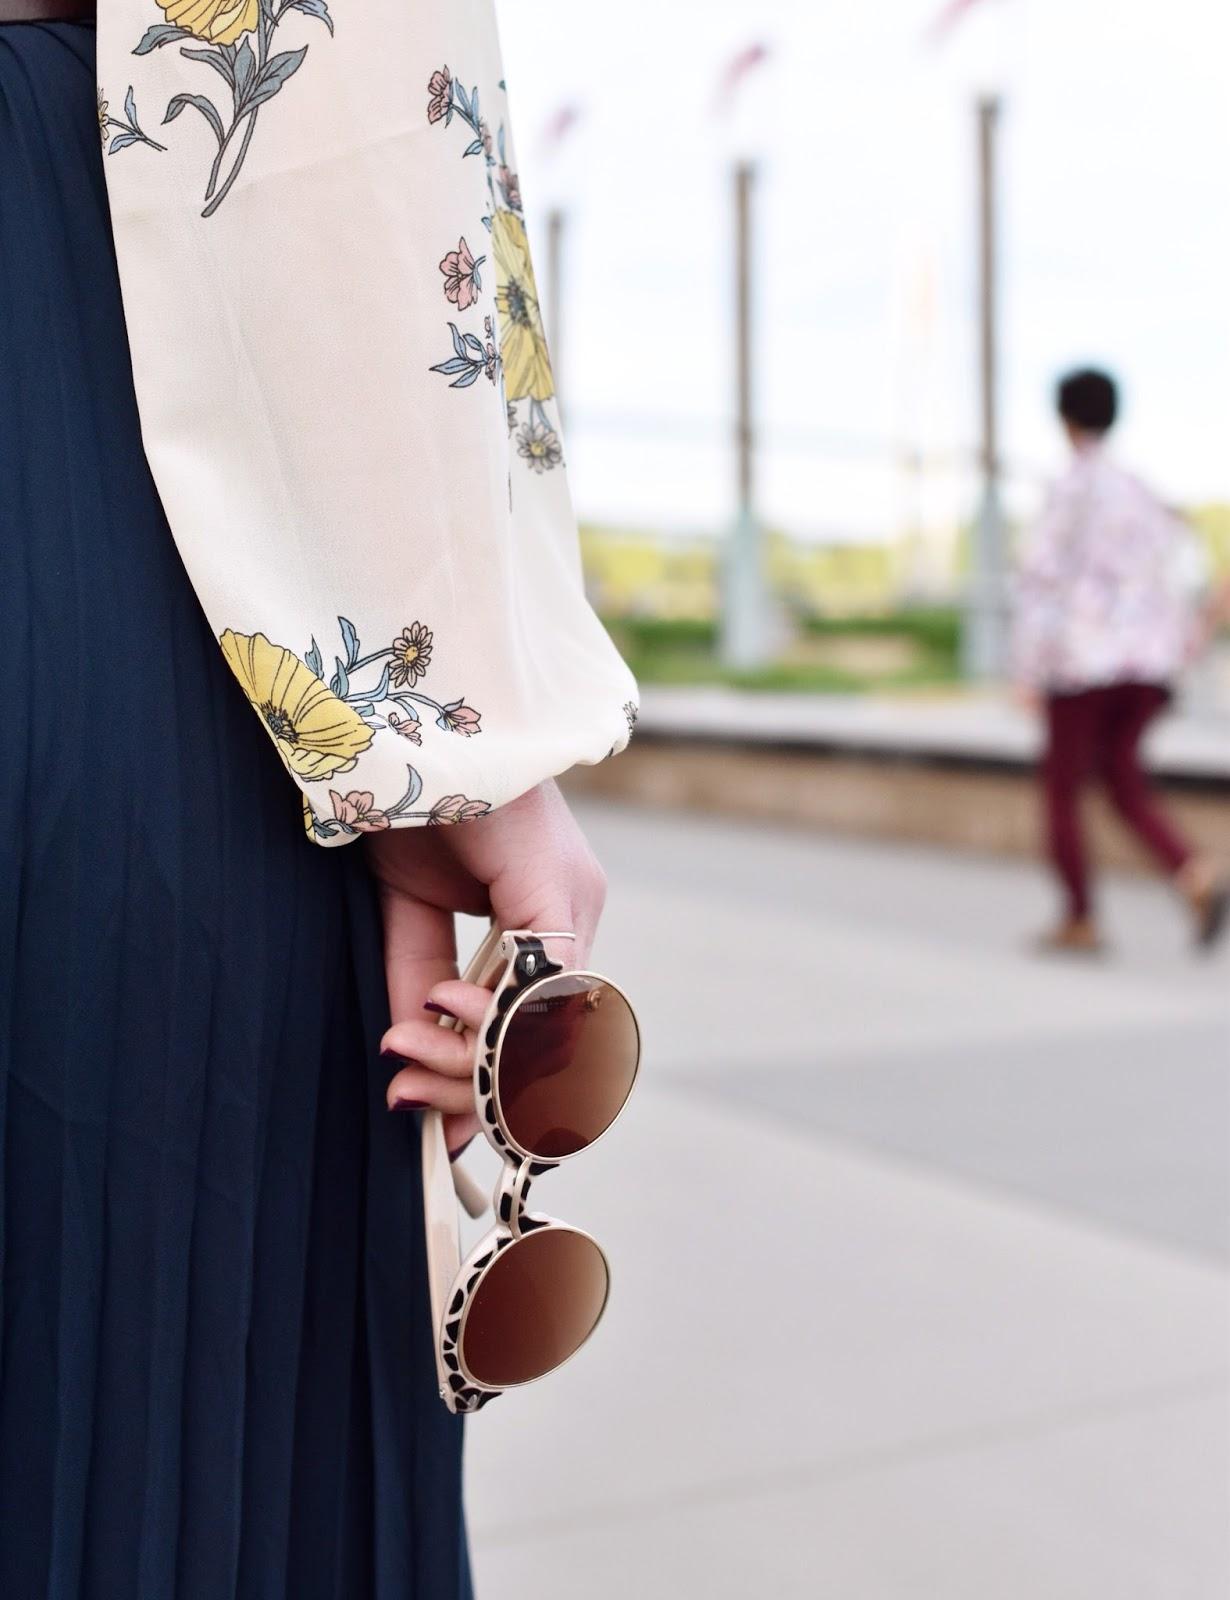 Monika Faulkner outfit inspiration - pleated maxi skirt, floral blouse, corset belt, Nanette animal-patterned sunglasses